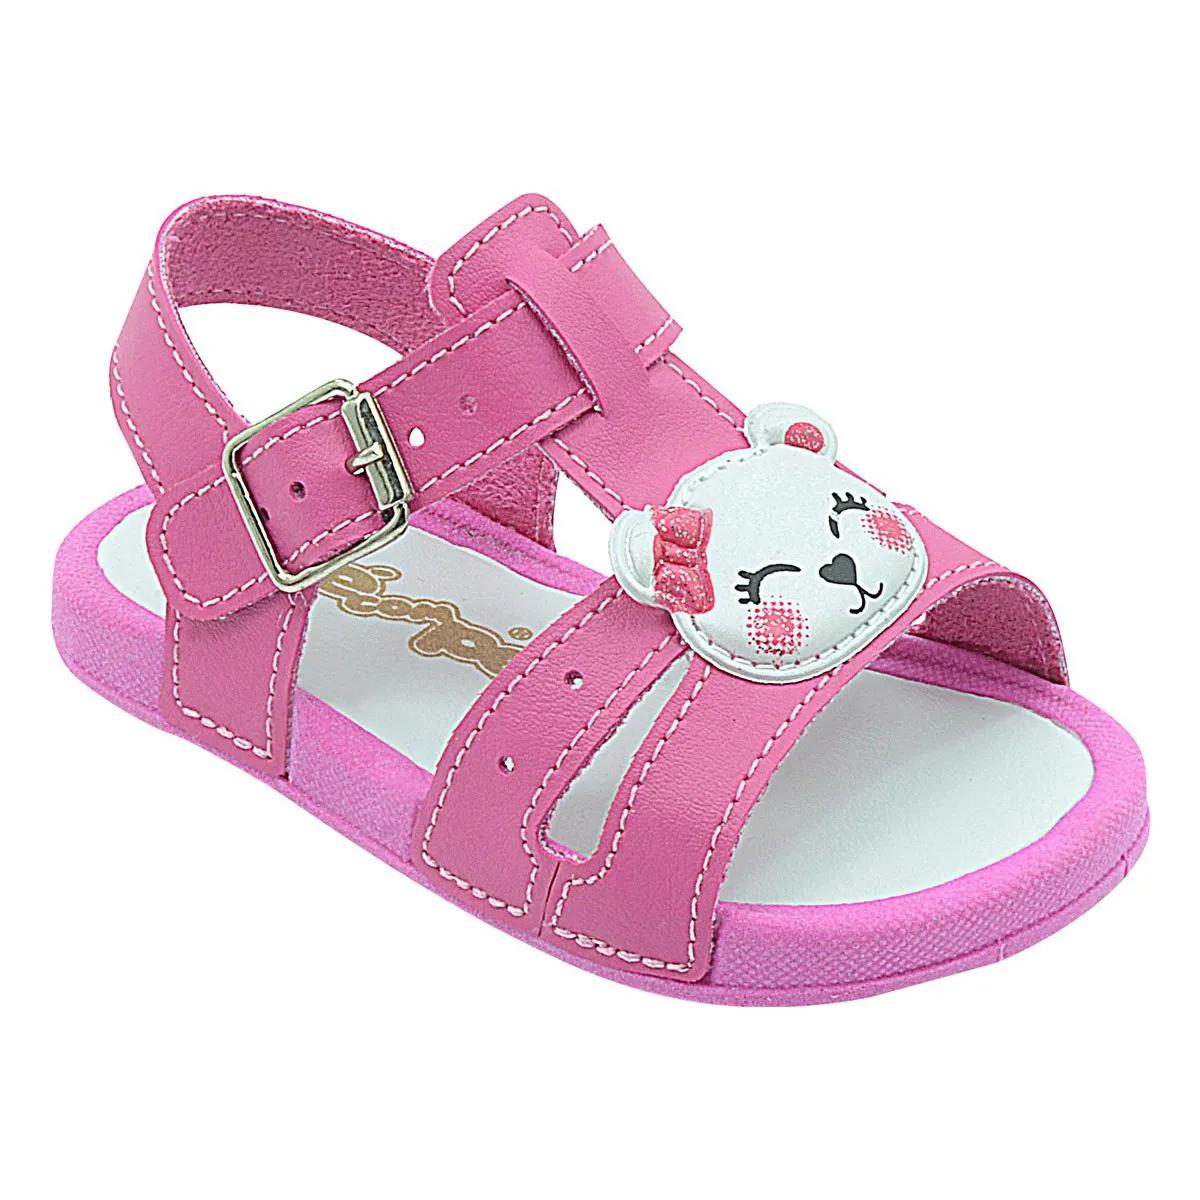 Papete Neném Infantil Ursinha Pink Feminina